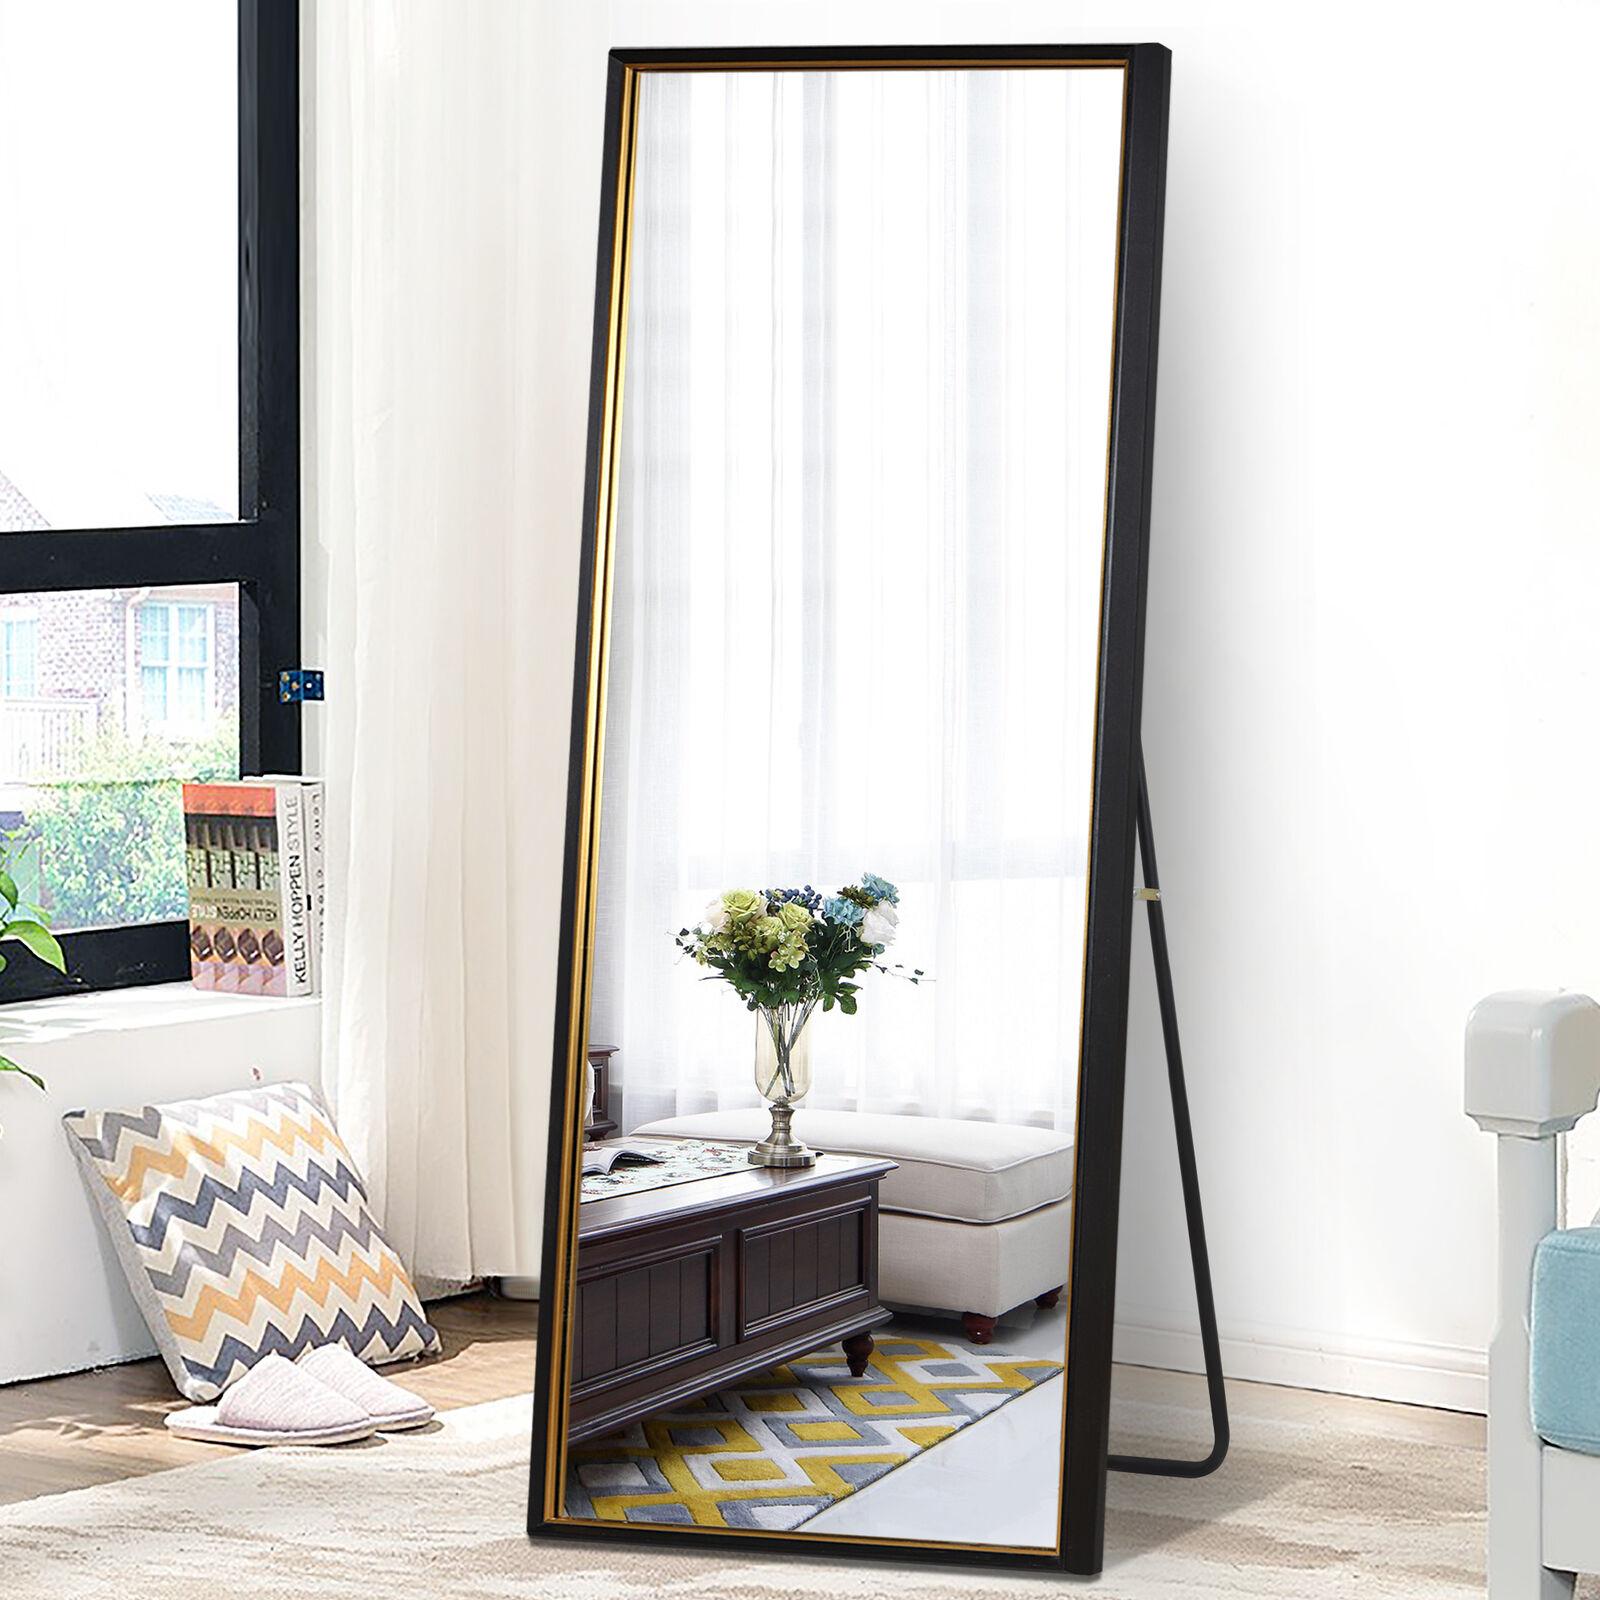 Pexfix 65 X22 Full Length Mirror Standing Floor Mirror Modern Black Gold For Sale Online Ebay